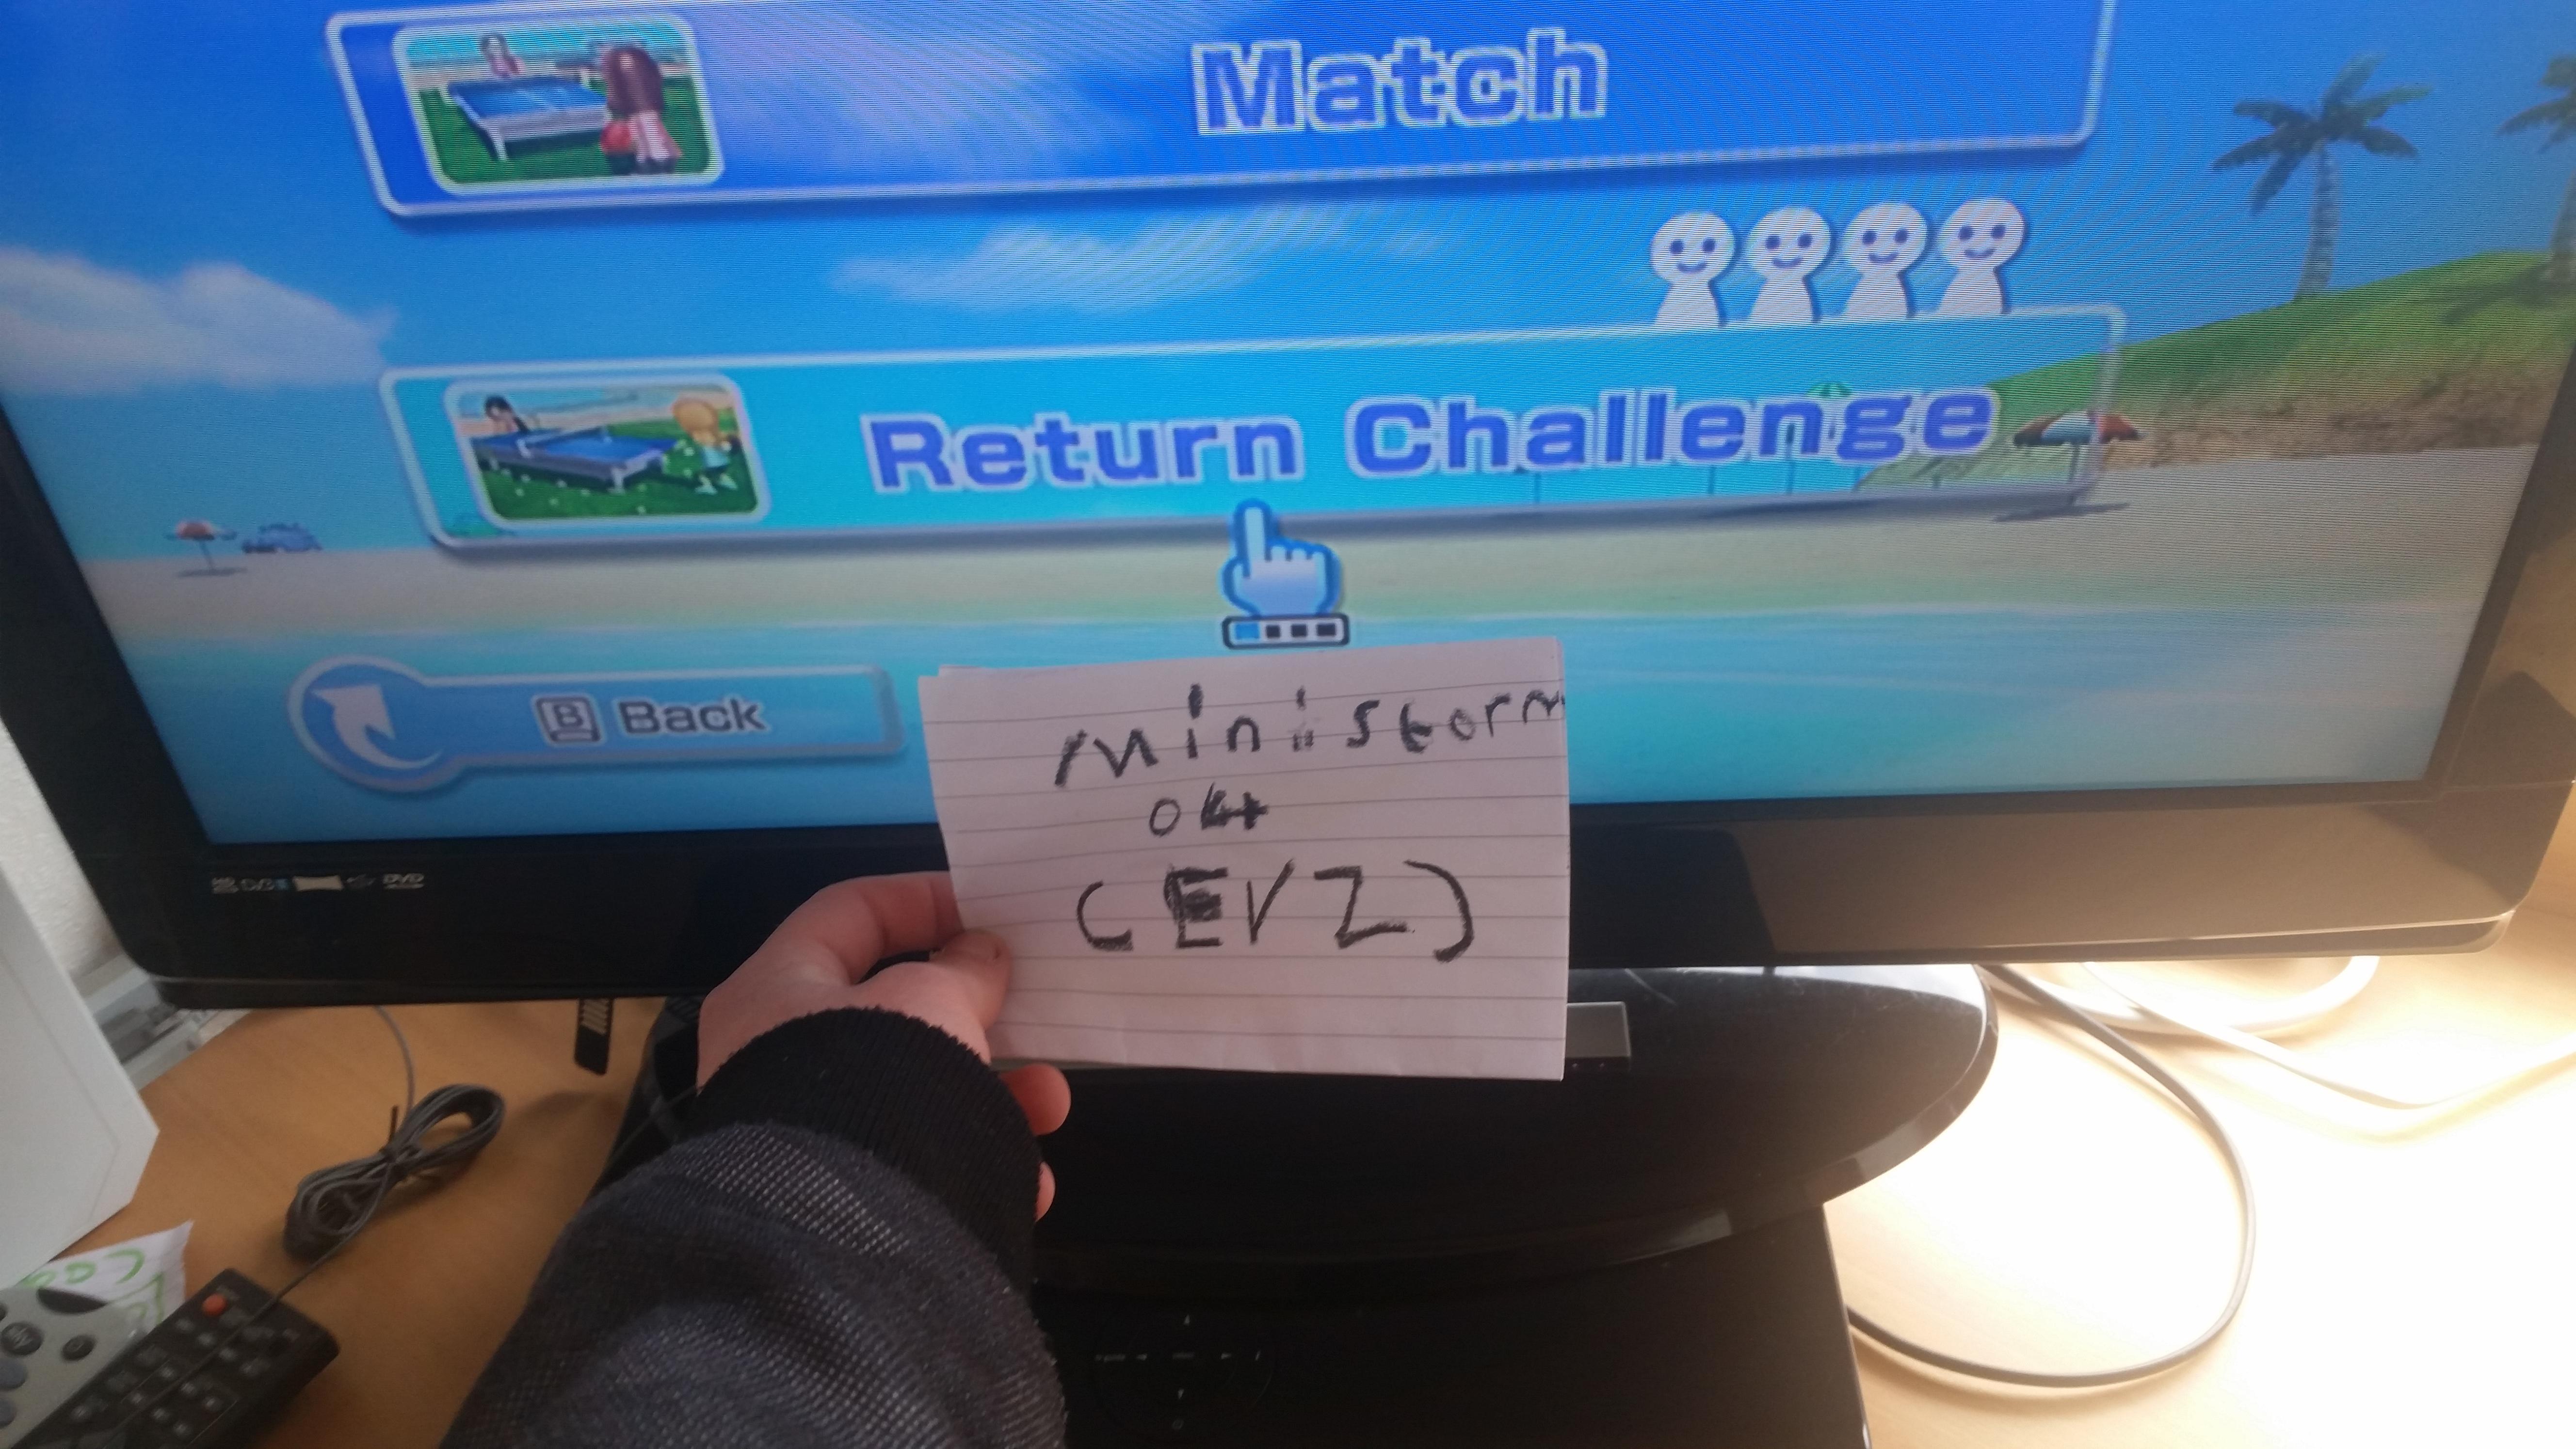 Wii Sports: Tennis [Returning Balls] 41 points